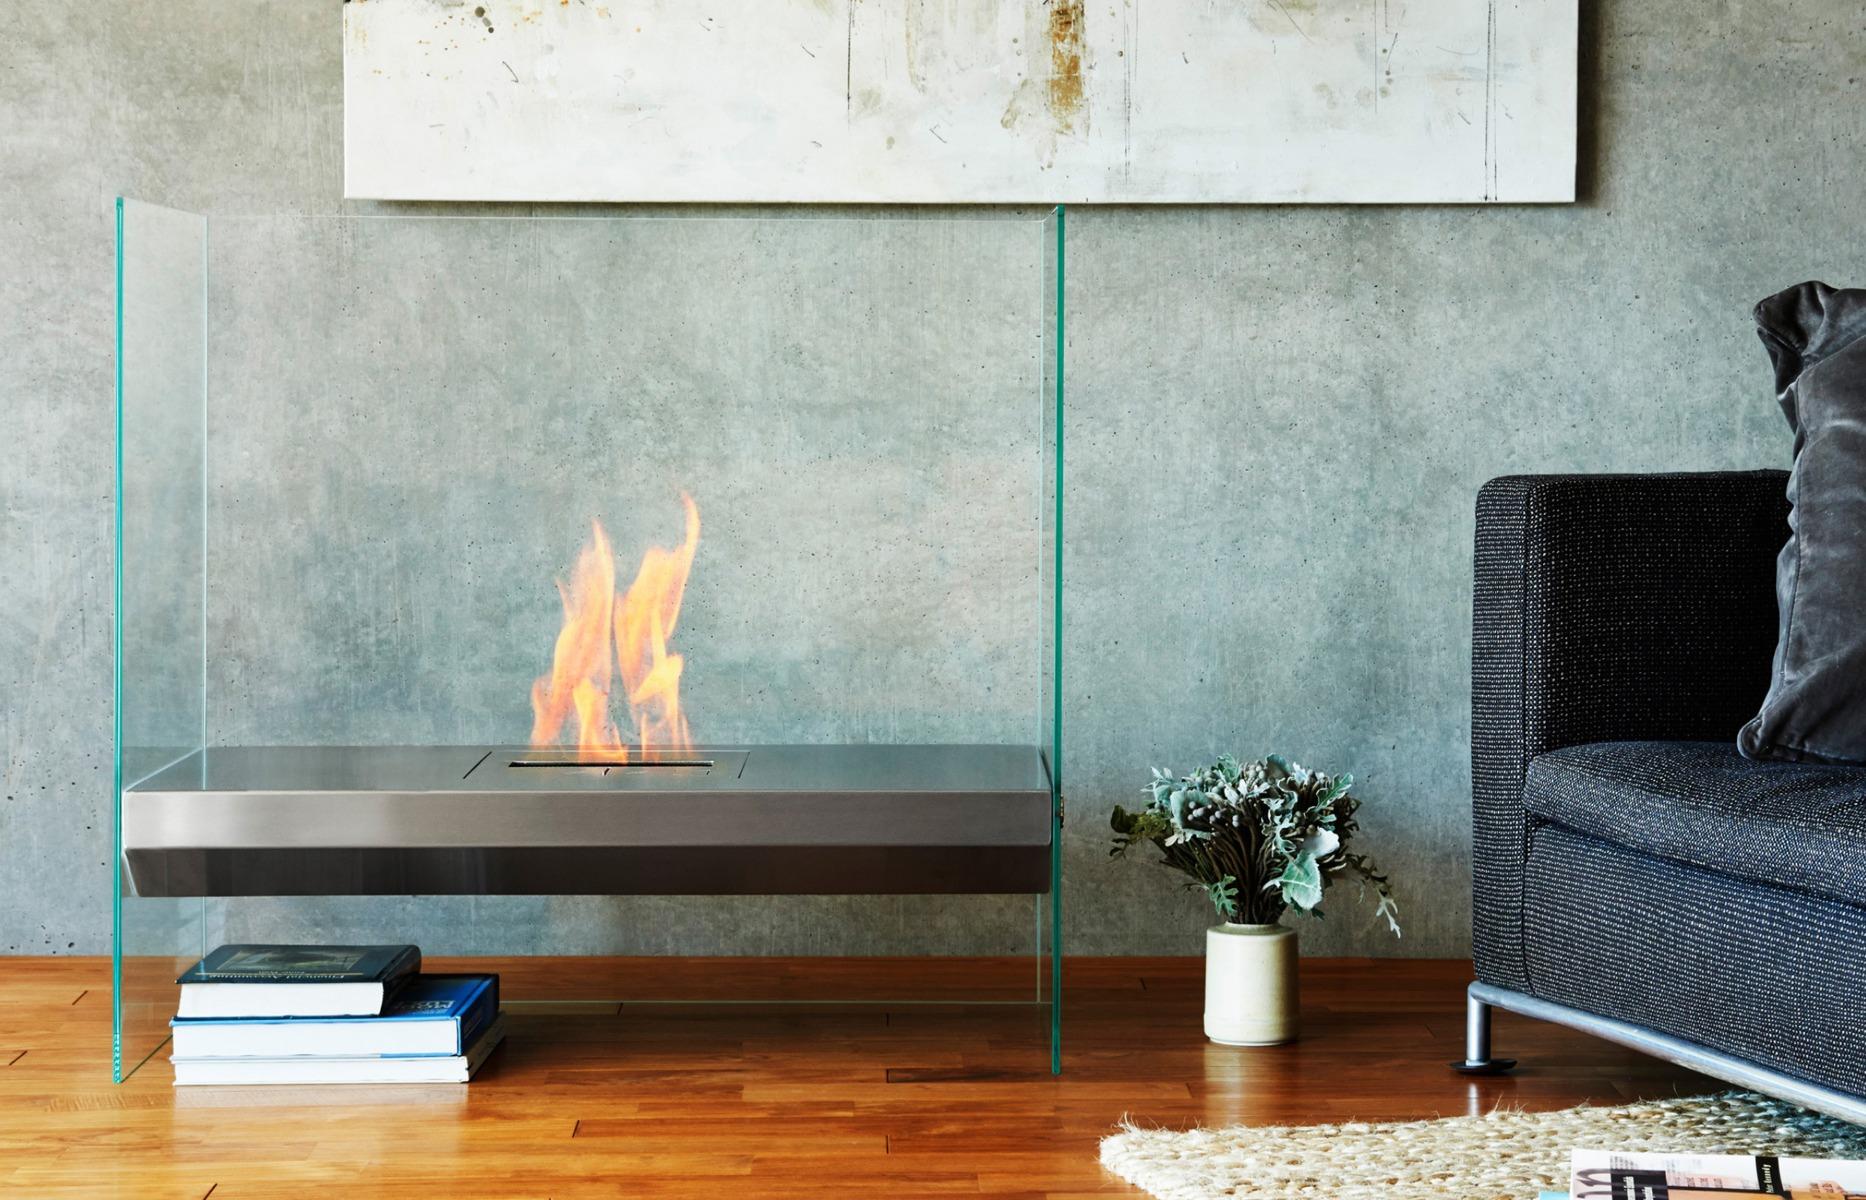 EcoSmart Fire Igloo BK5 Designer Fireplace